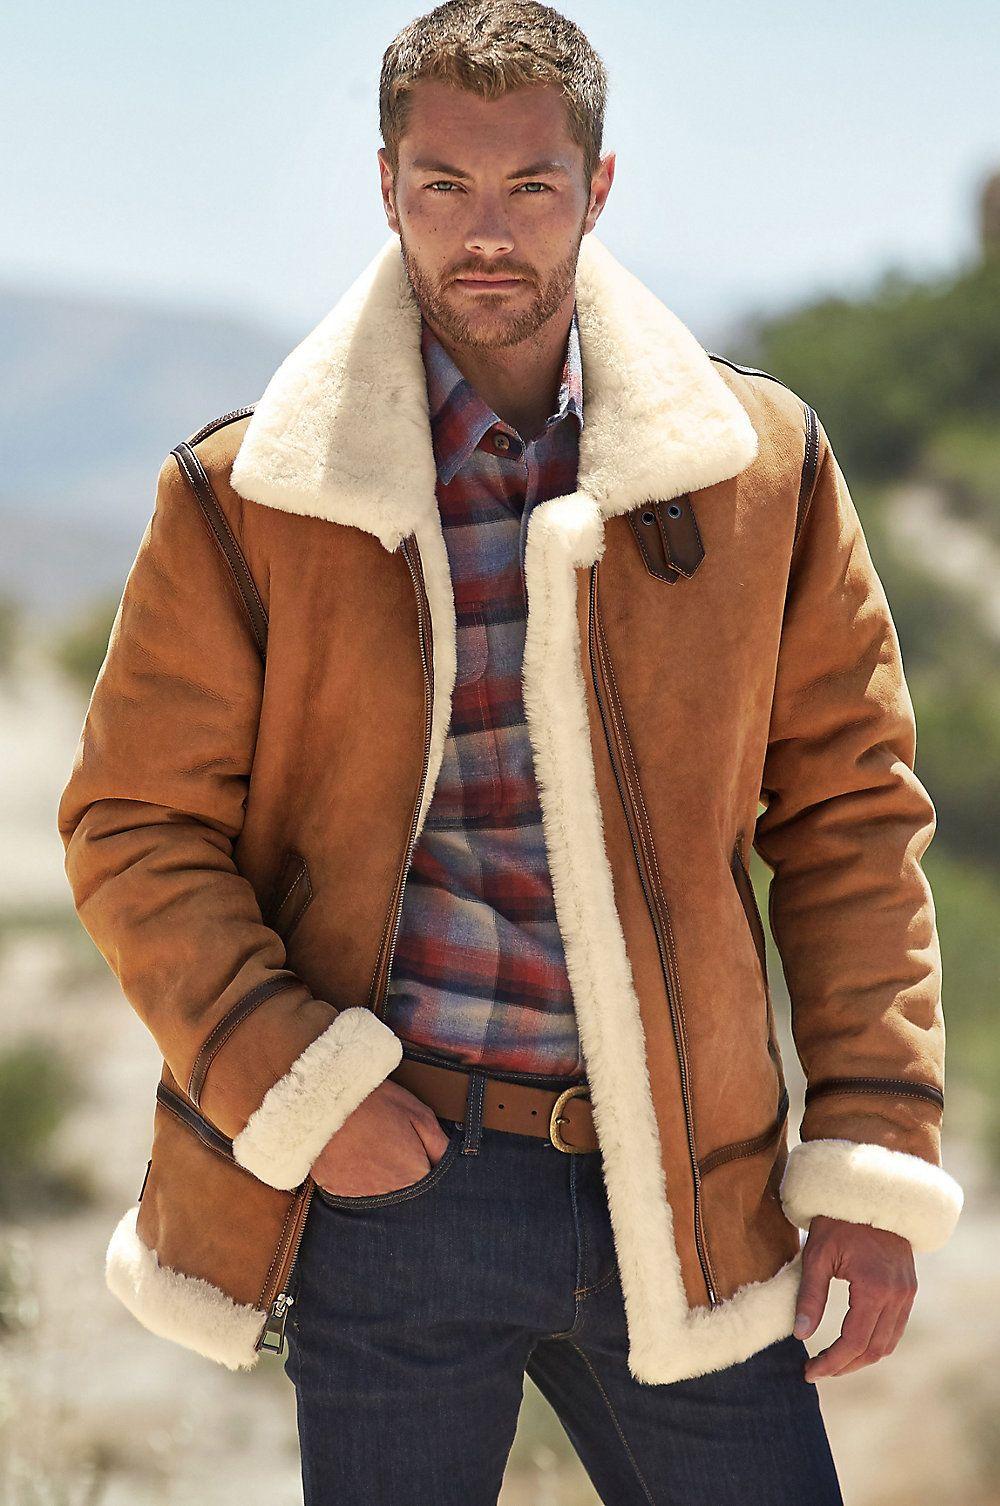 Jason Sheepskin B 3 Bomber Jacket In 2021 Mens Shearling Jacket Custom Leather Jackets Aviator Jackets [ 1506 x 1000 Pixel ]